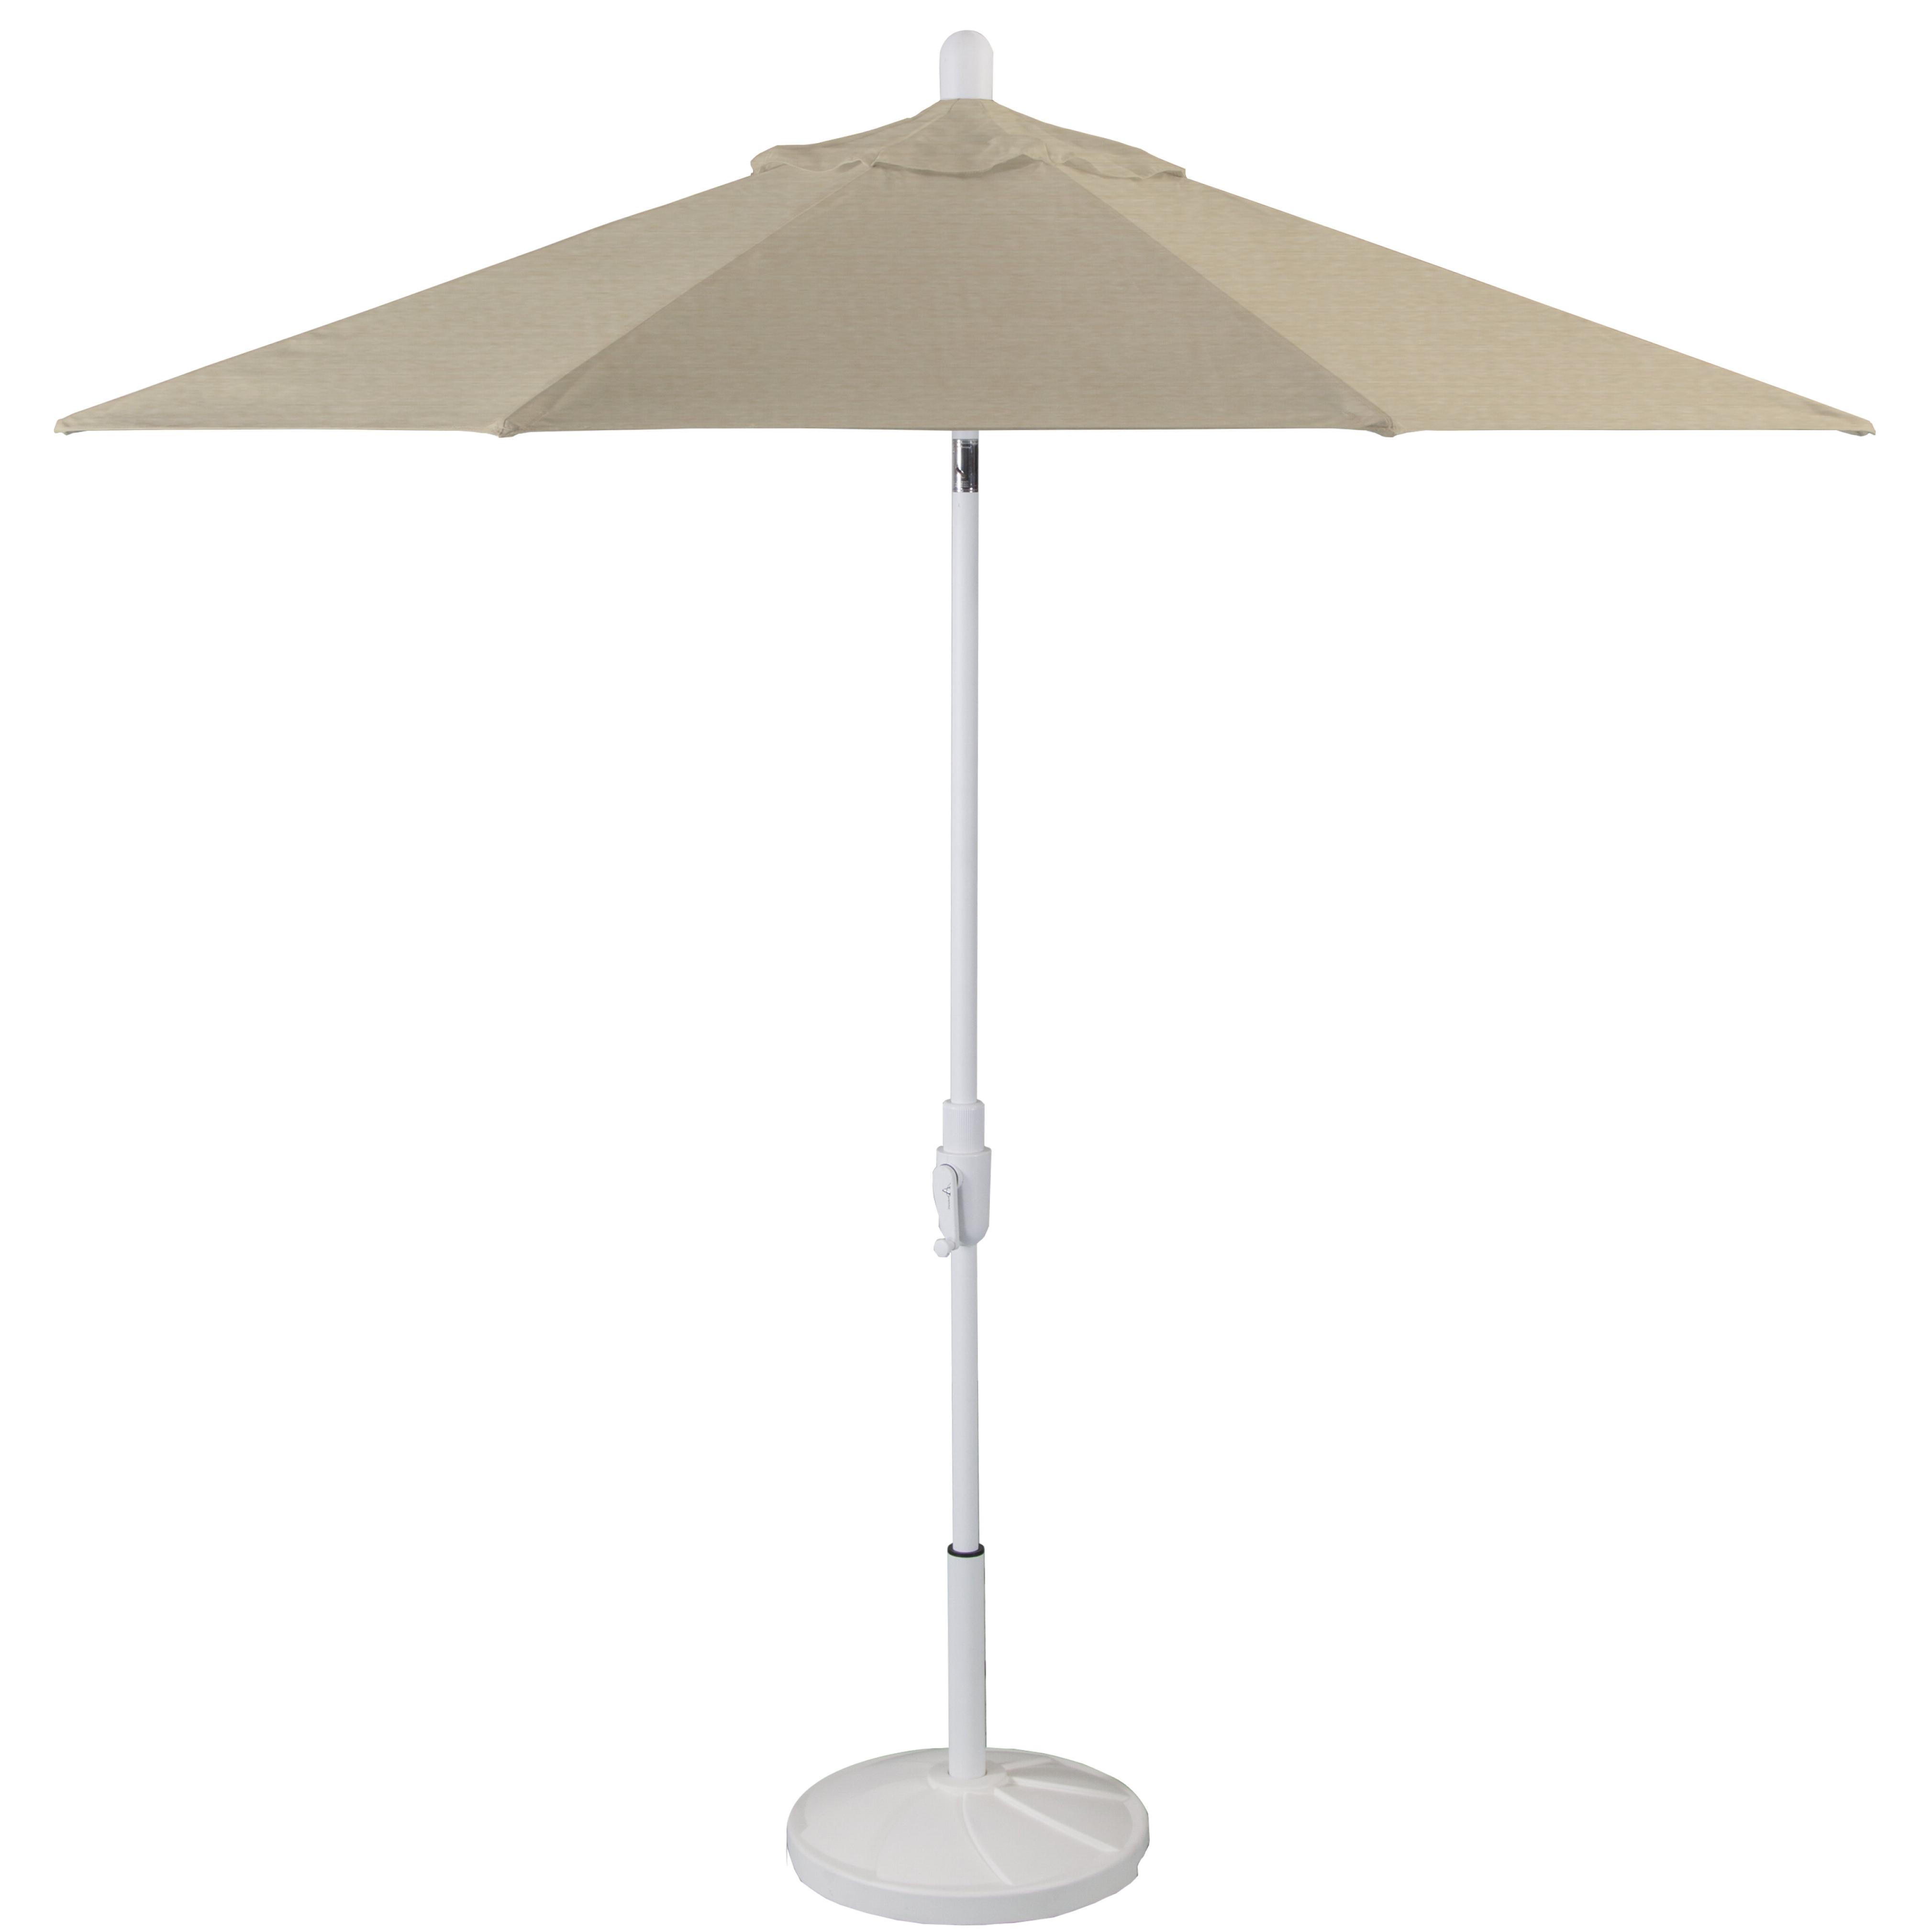 Current Wiebe 9' Market Sunbrella Umbrella Intended For Wiebe Market Sunbrella Umbrellas (View 4 of 20)